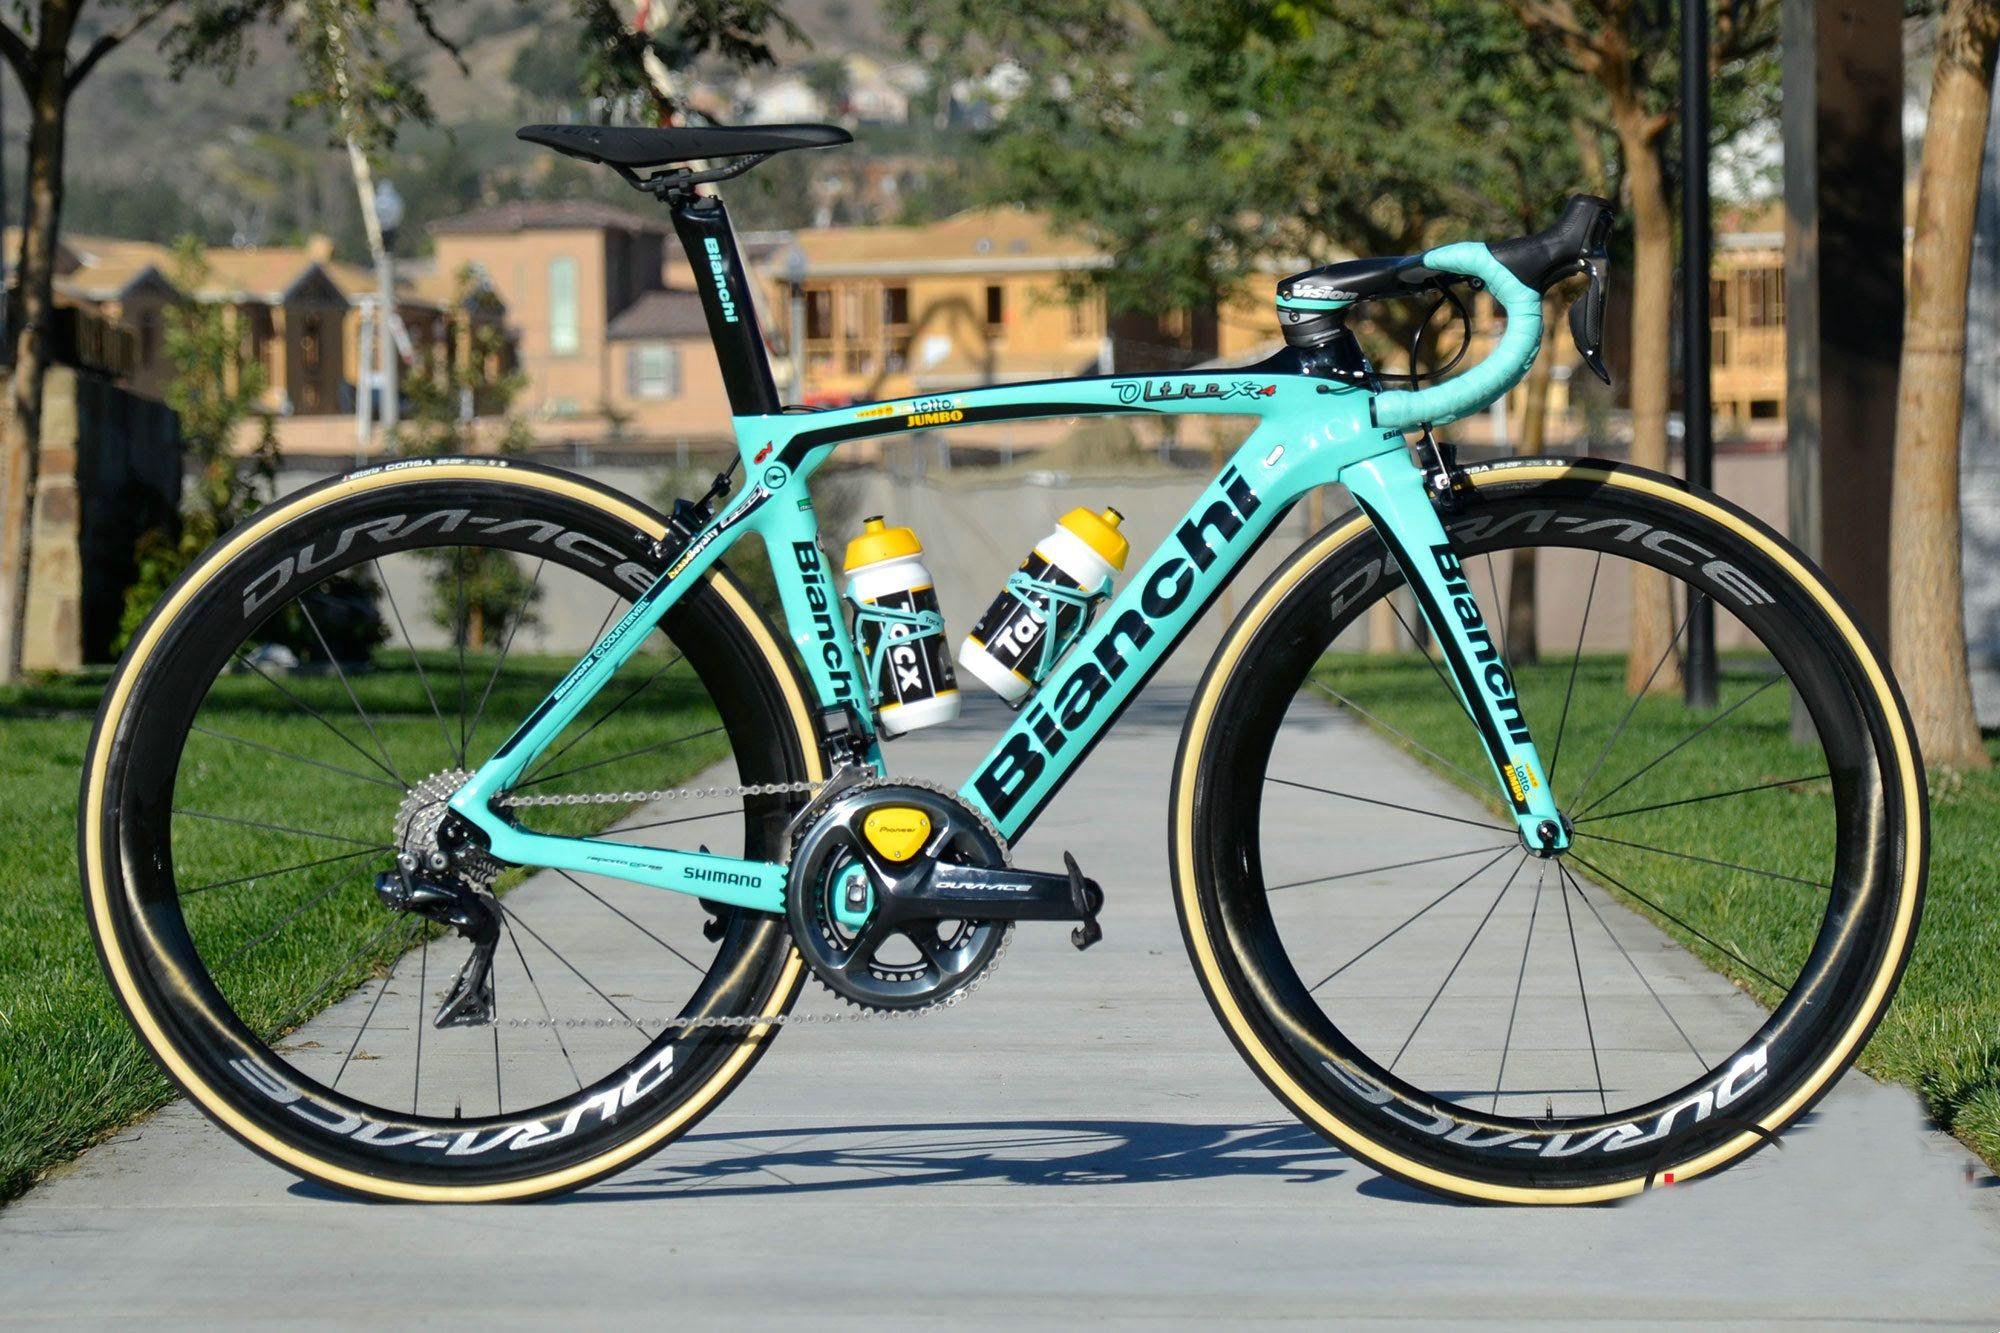 da9ed560a4 Bianchi Team Lotto Jumbo Bianchi Oltre XR4 Complete Bike Dura ace wheelset  Sale carbon handlebar saddle